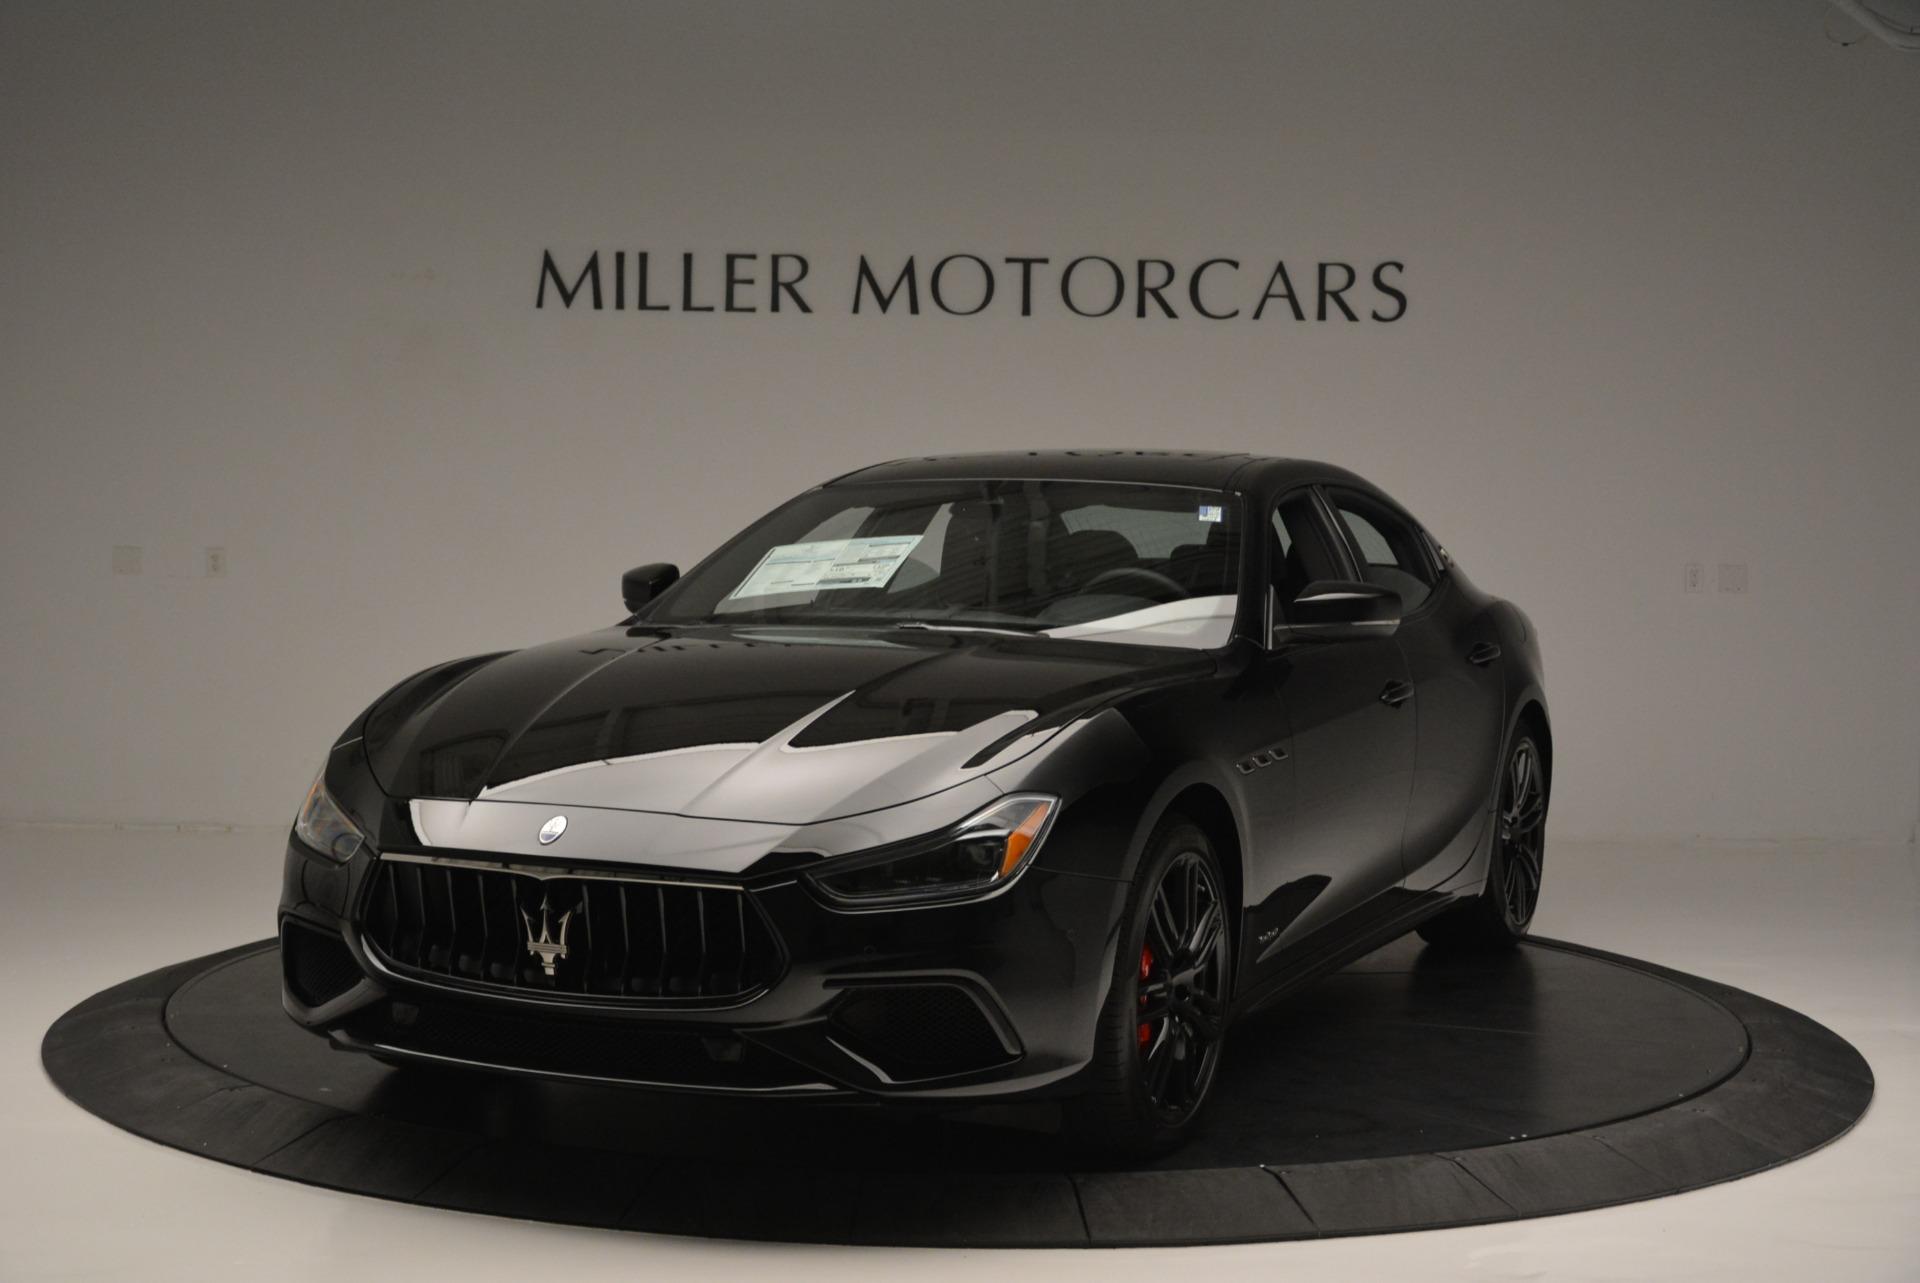 New 2018 Maserati Ghibli SQ4 GranSport Nerissimo For Sale In Westport, CT 2368_main